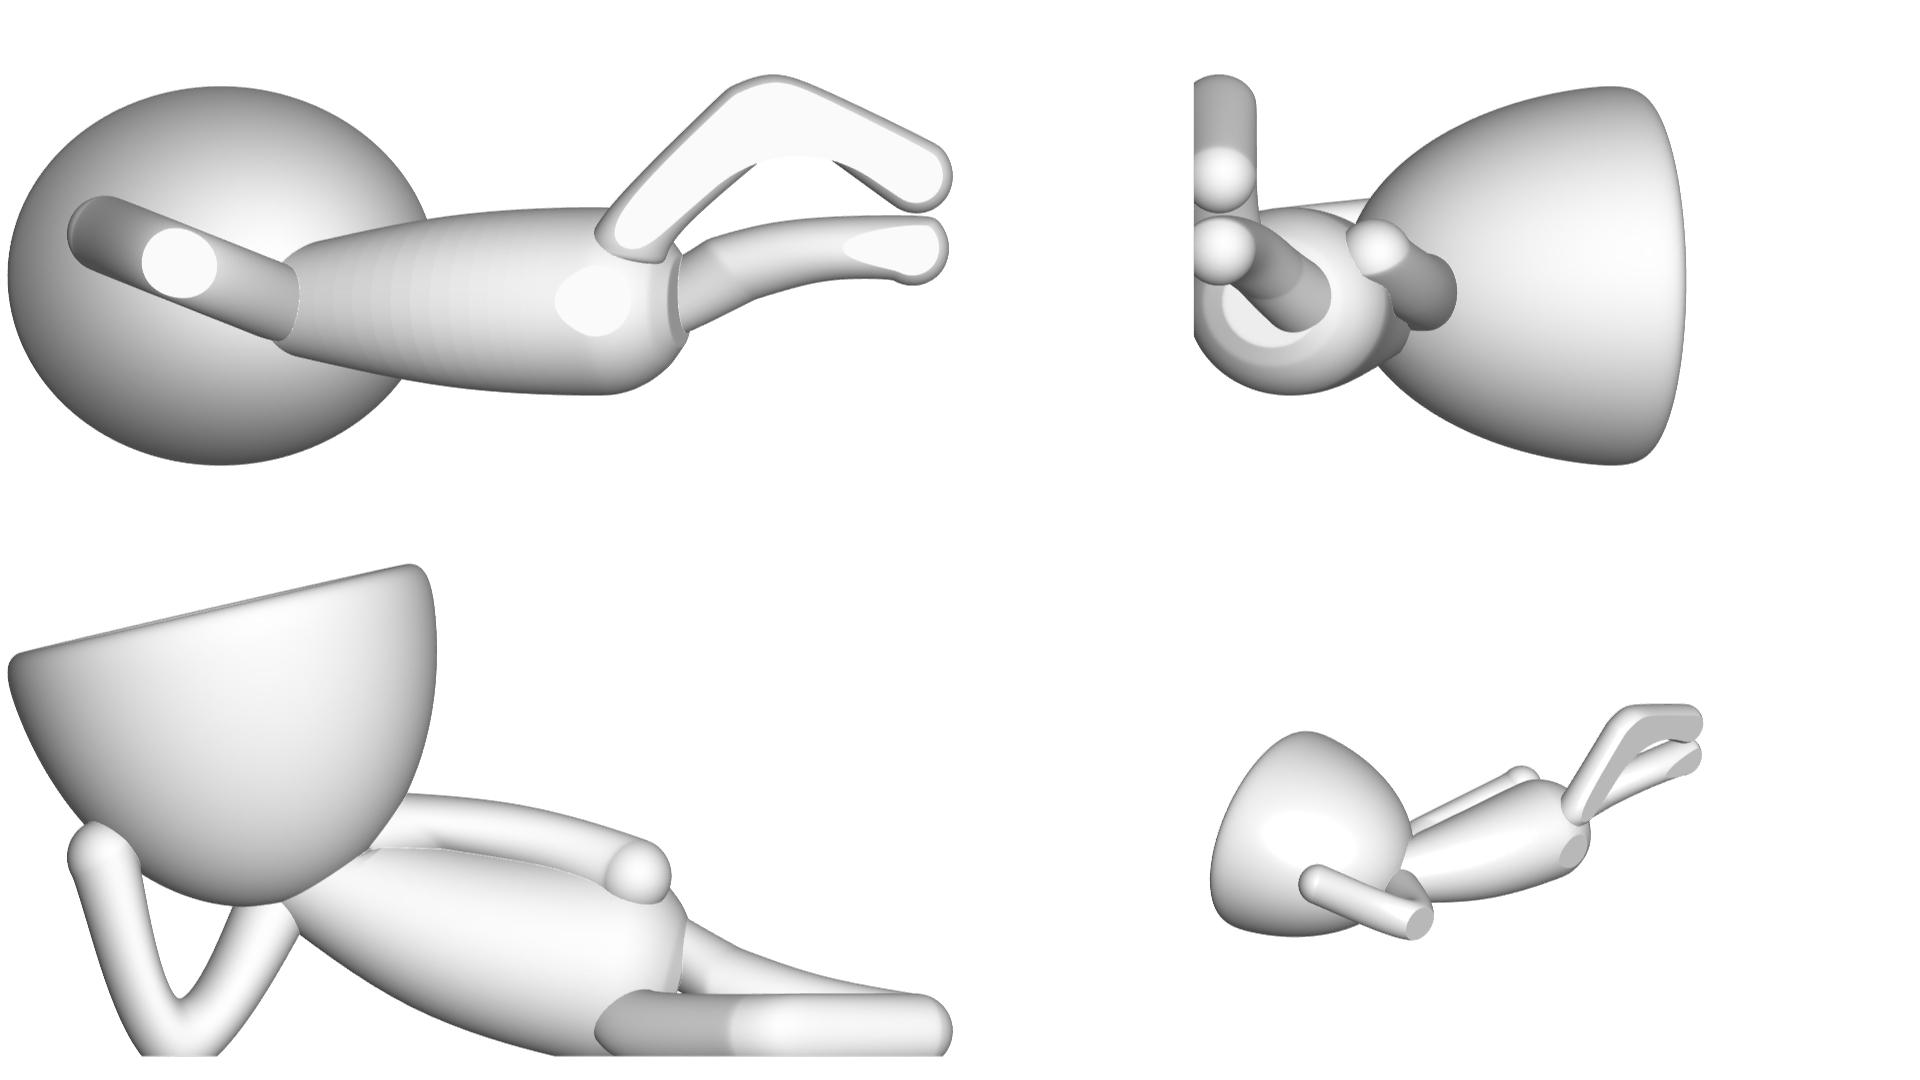 Vaso_10_Blanco_2.jpg Download free STL file JARRÓN MACETA ROBERT 10 - VASE FLOWERPOT ROBERT 10 • 3D printable object, PRODUSTL56